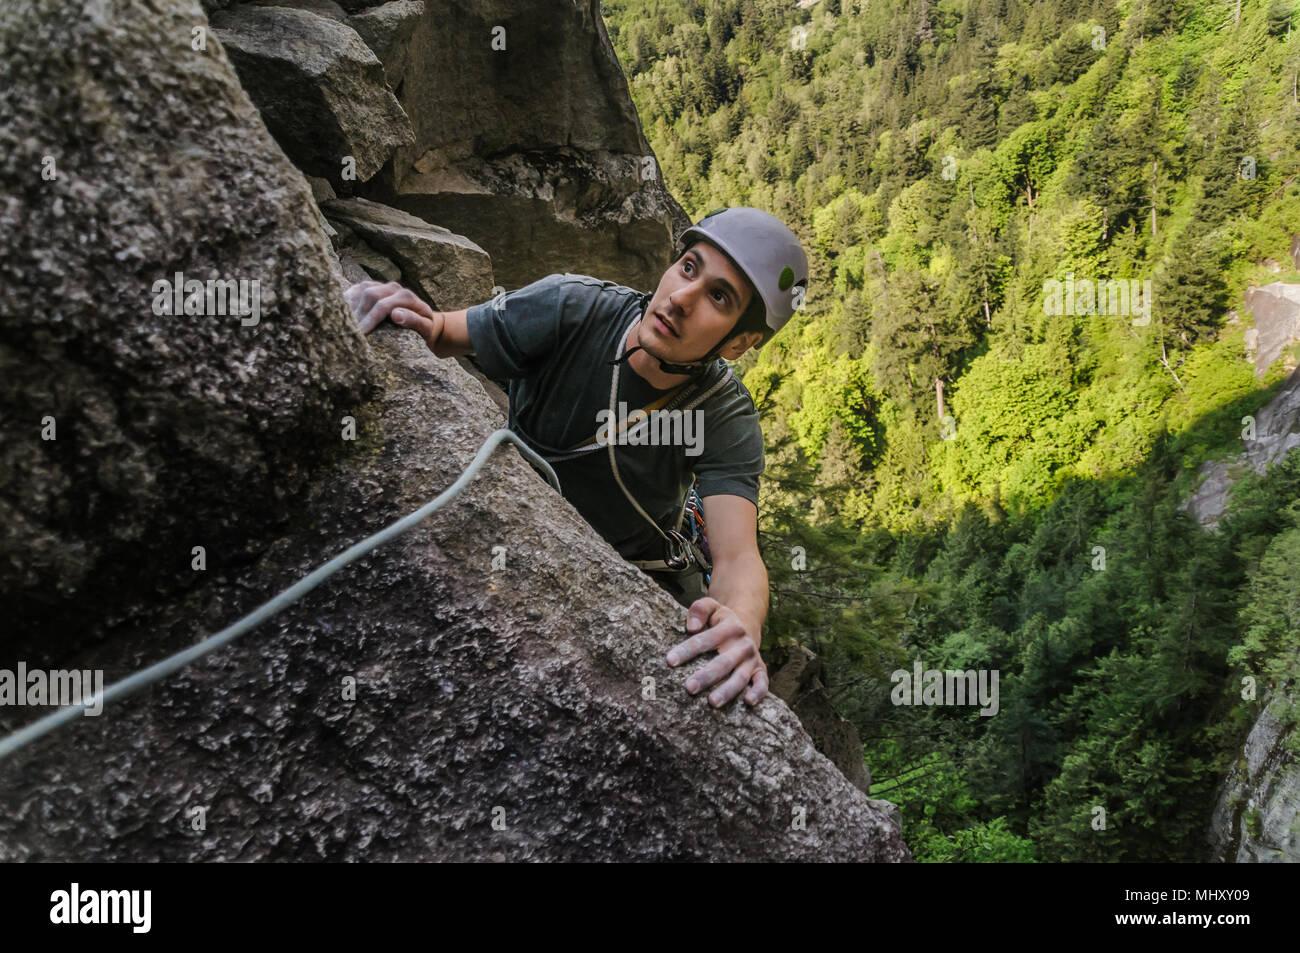 L'homme au niveau du chef d'escalade trad, Squamish, Canada Banque D'Images